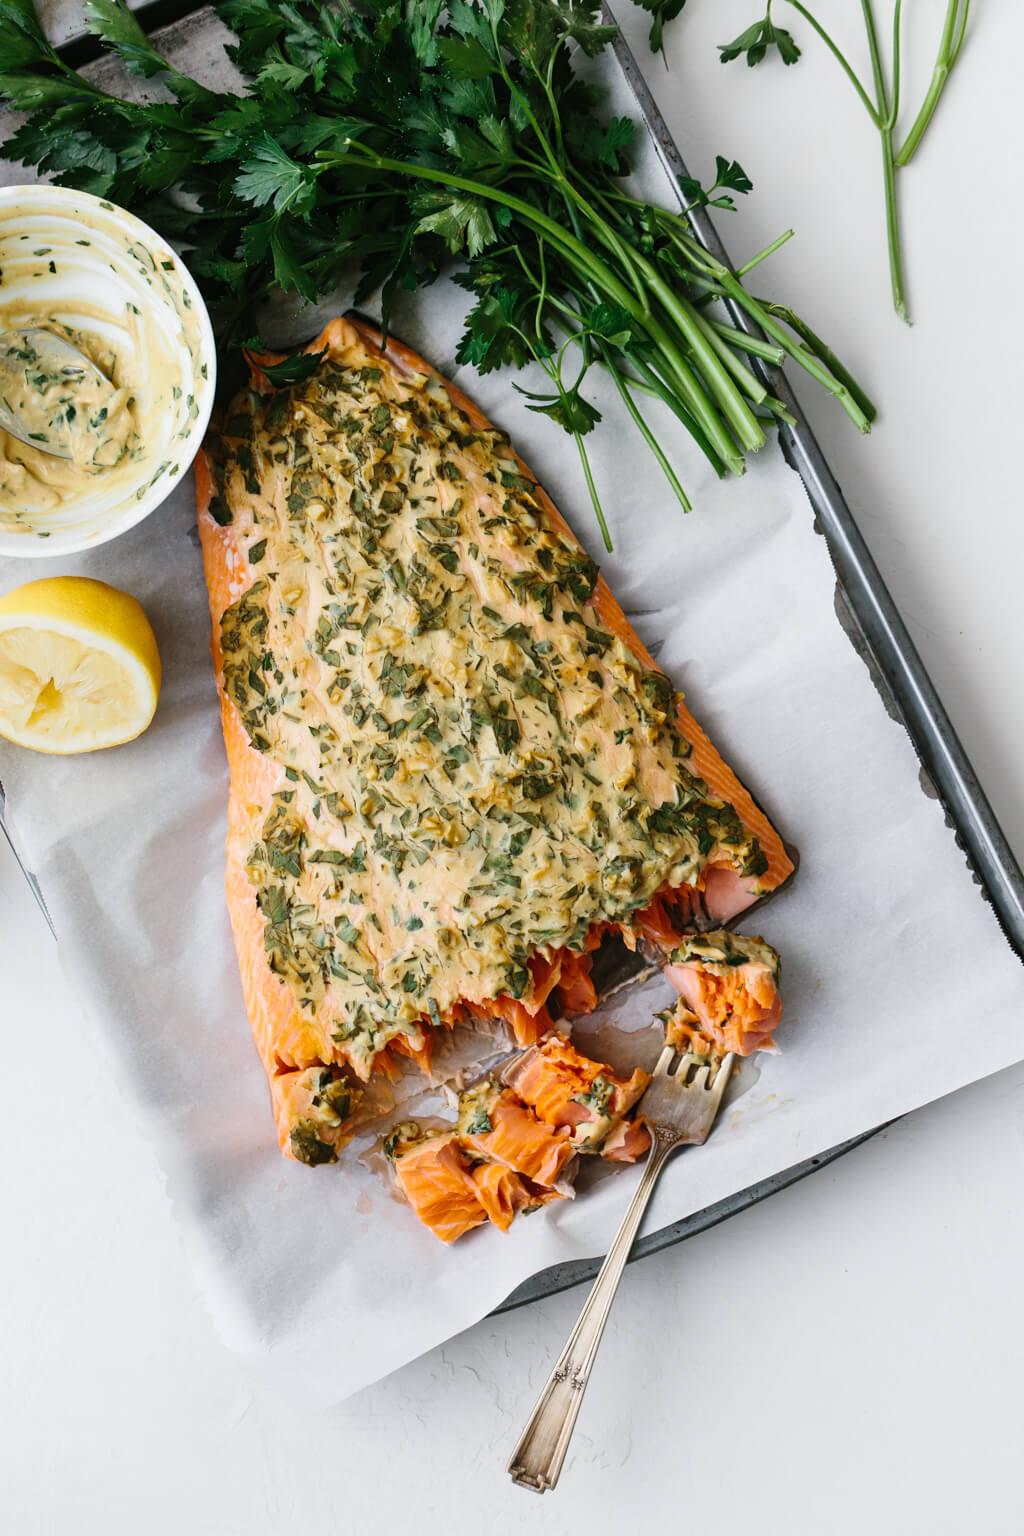 Dijon baked salmon on a baking sheet.